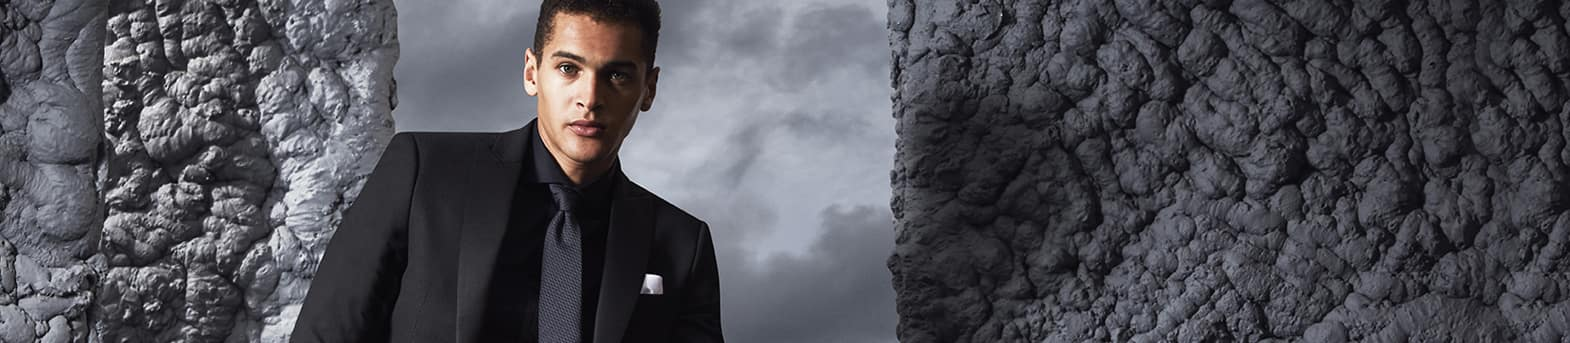 Black Tie Suits